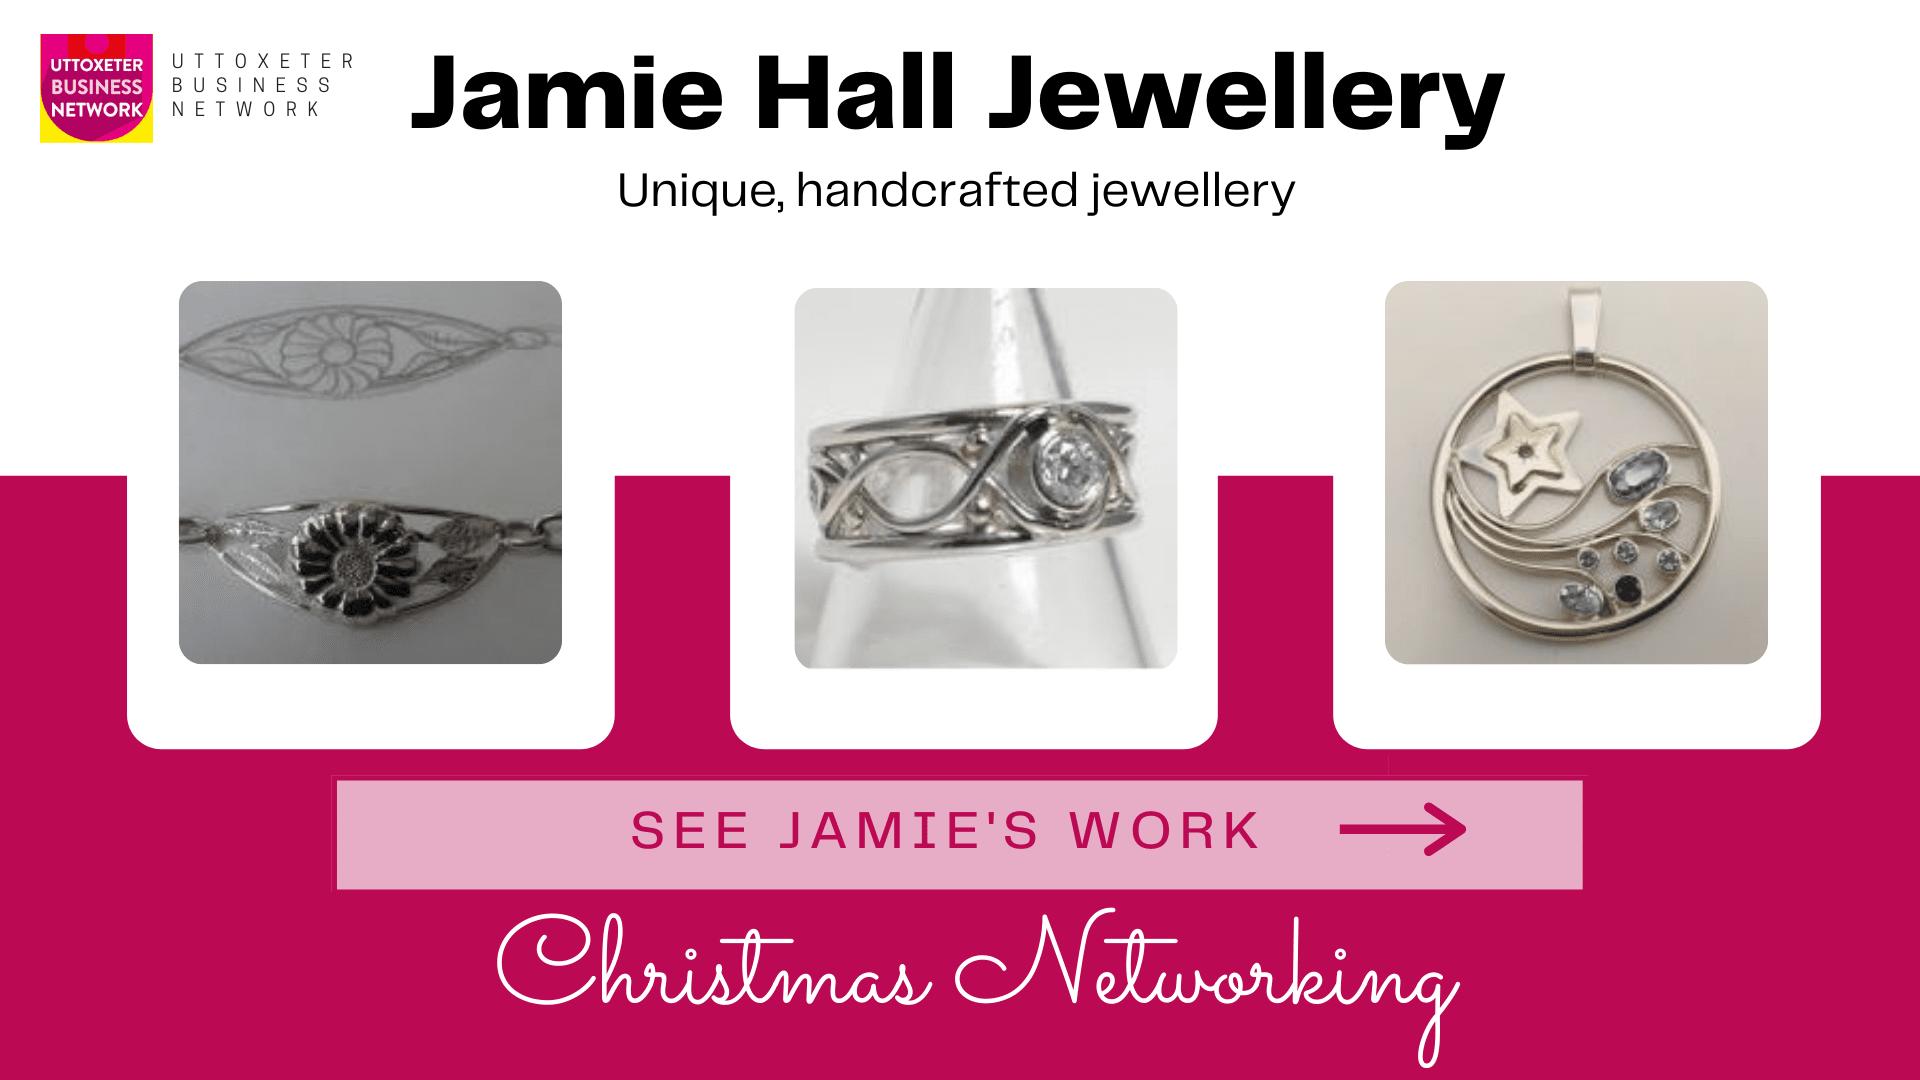 Jamie Hall Jewlery